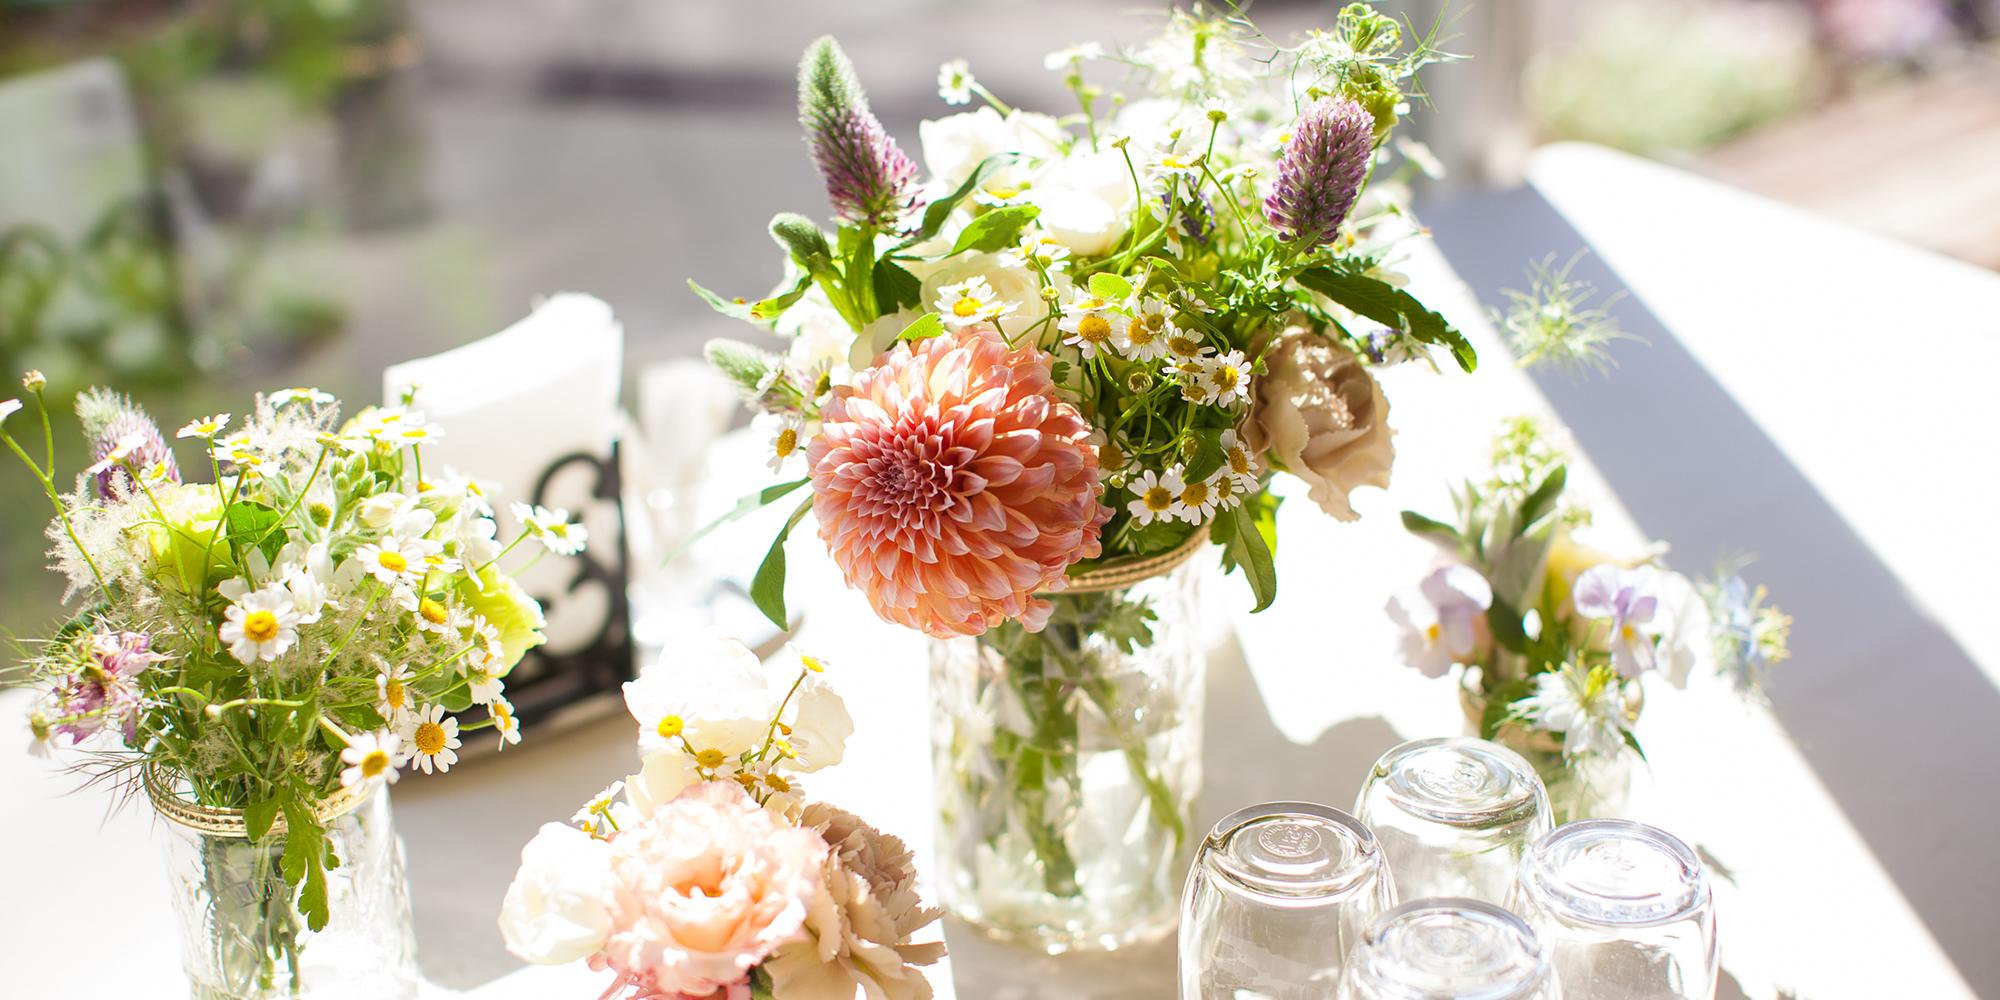 Flowers & Plants Hummingbird